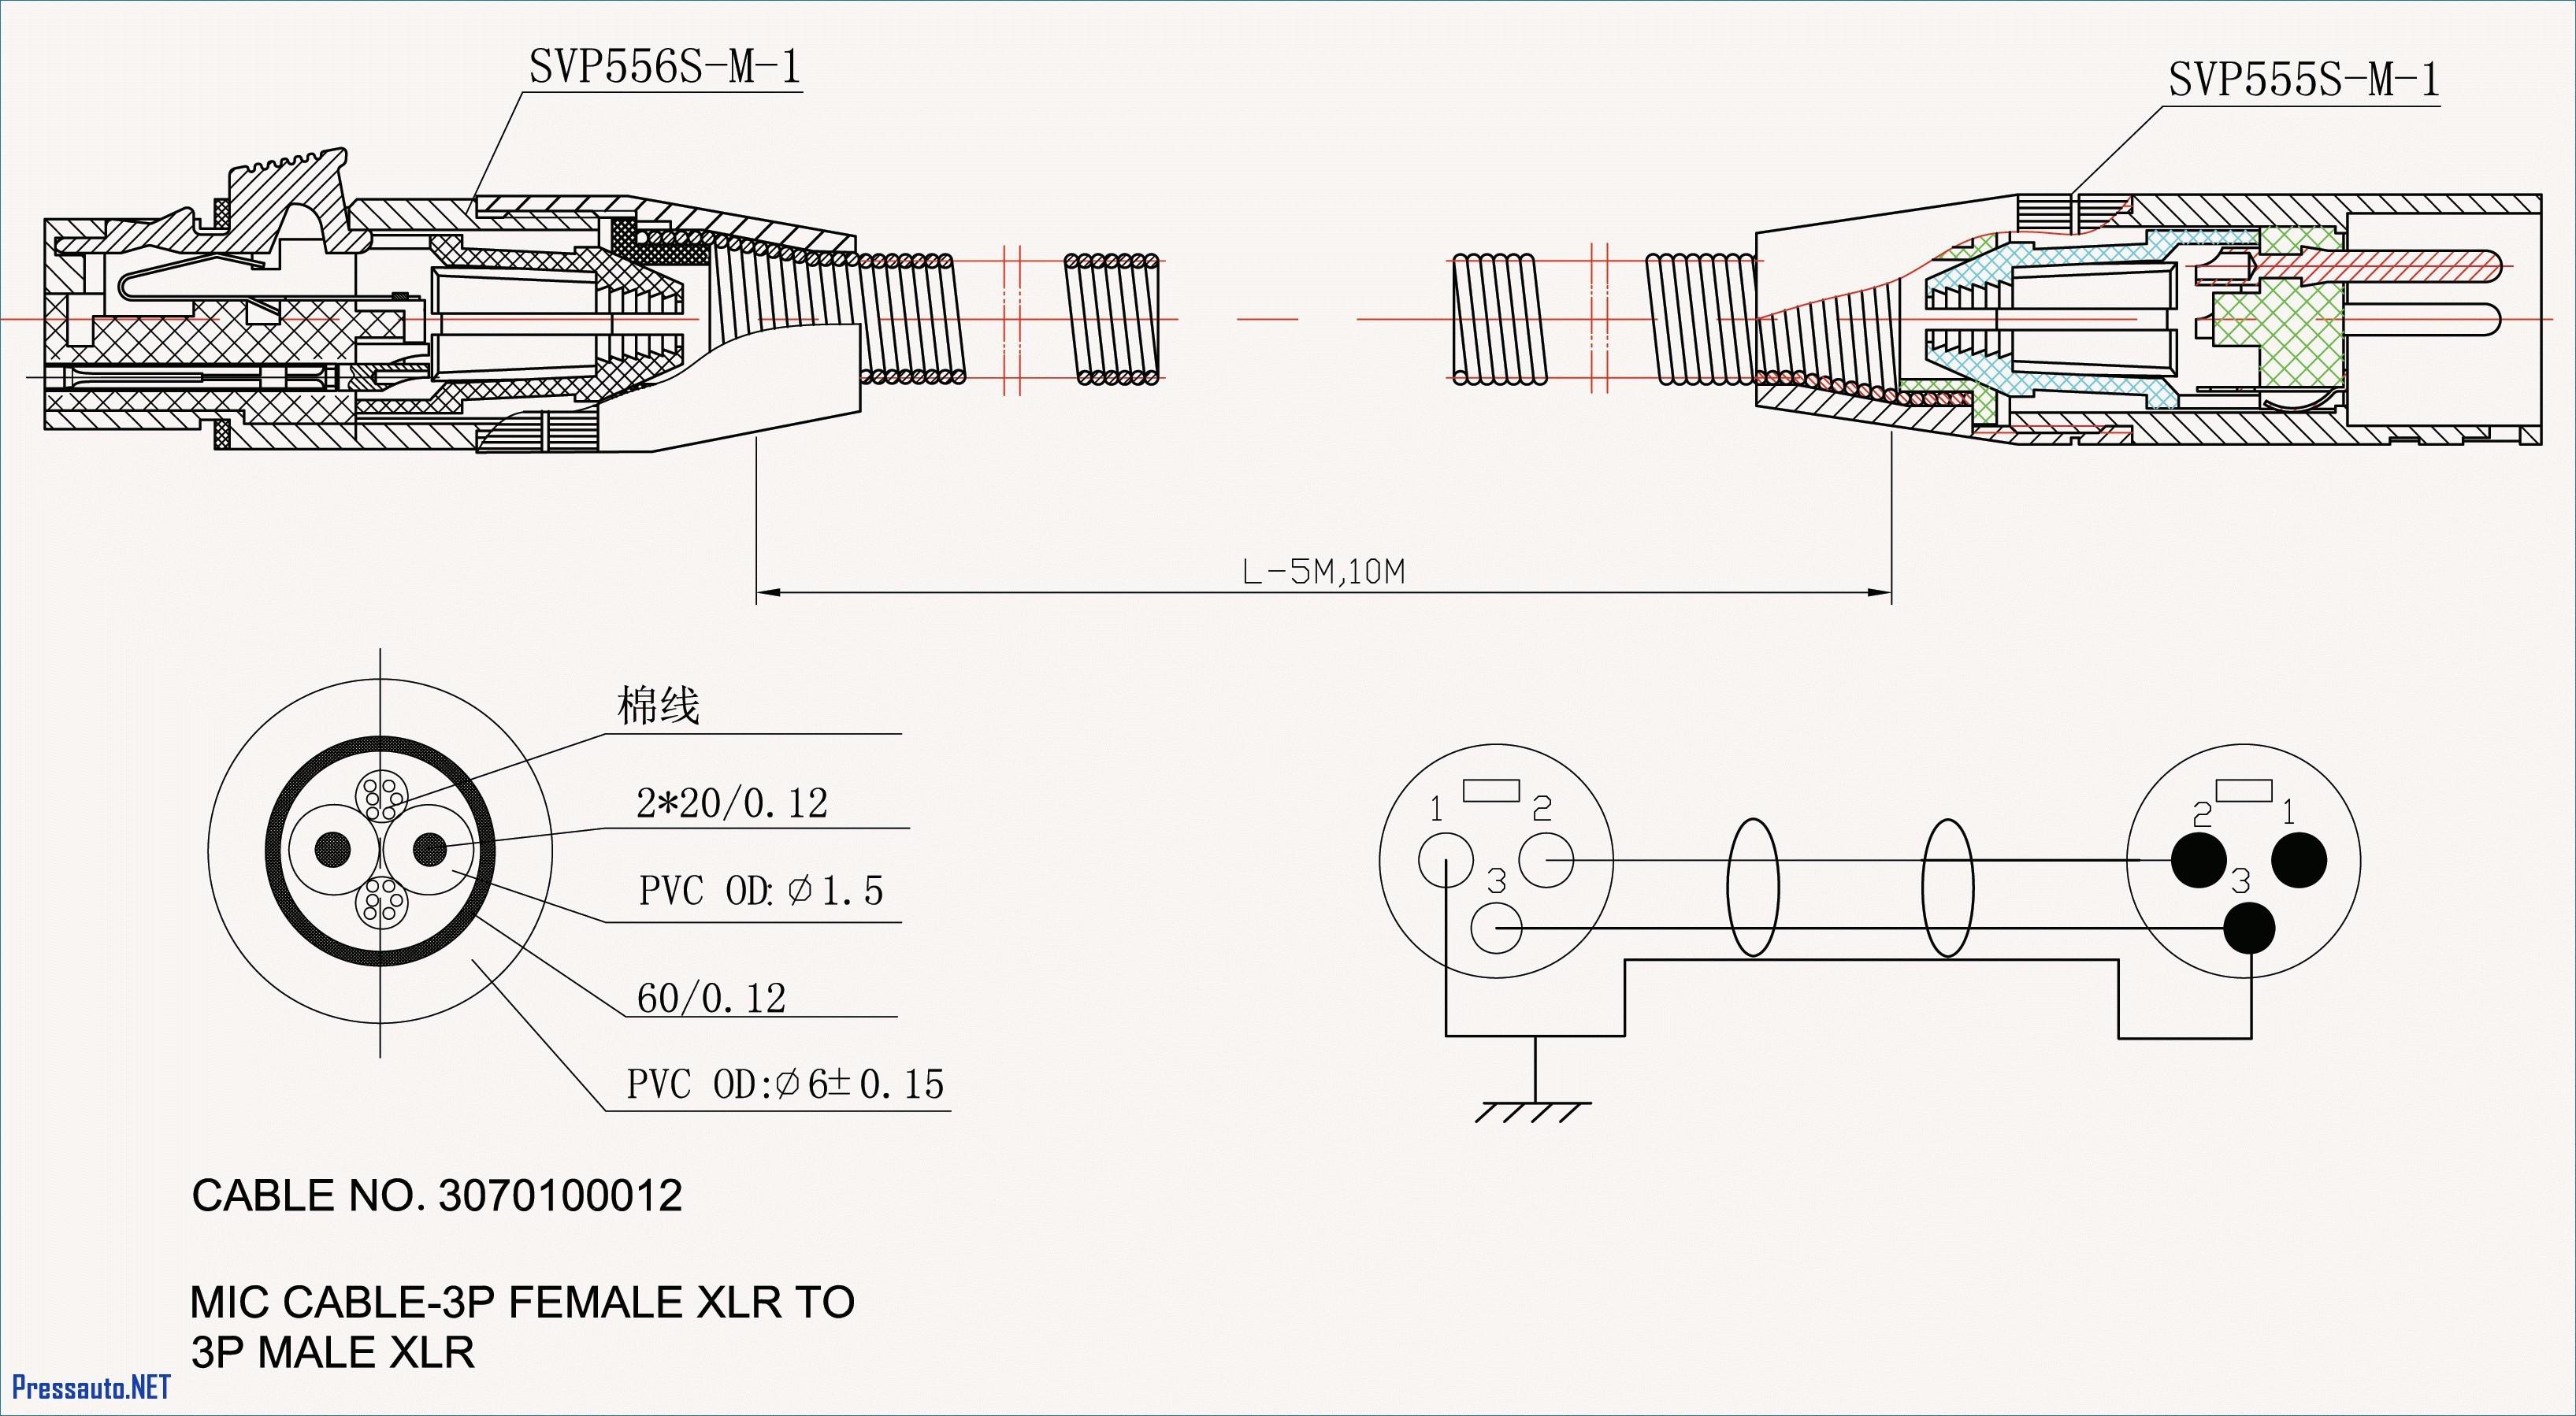 Denso Starter Solenoid Schematics Electrical Wiring Diagrams Jideco Relay Diagram Mopar Inspirational Image 1991 Toyota Truck